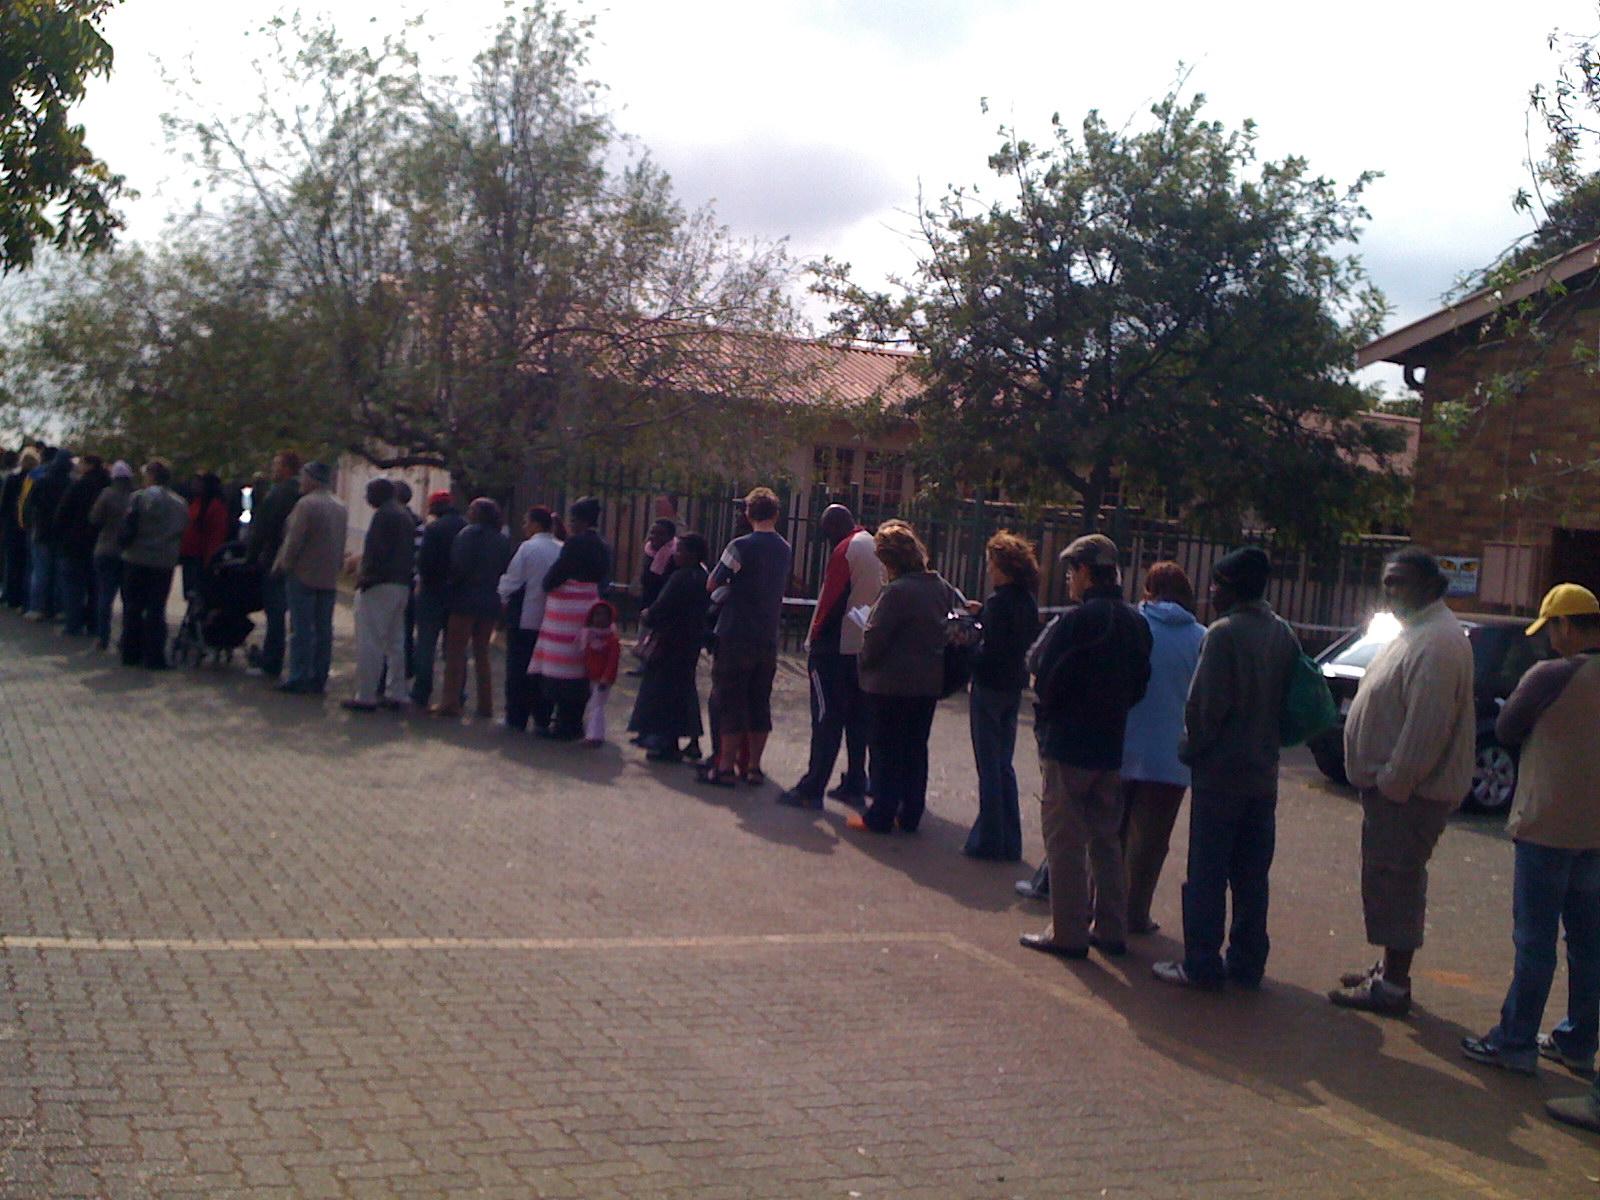 the voting line at westdene rec centre